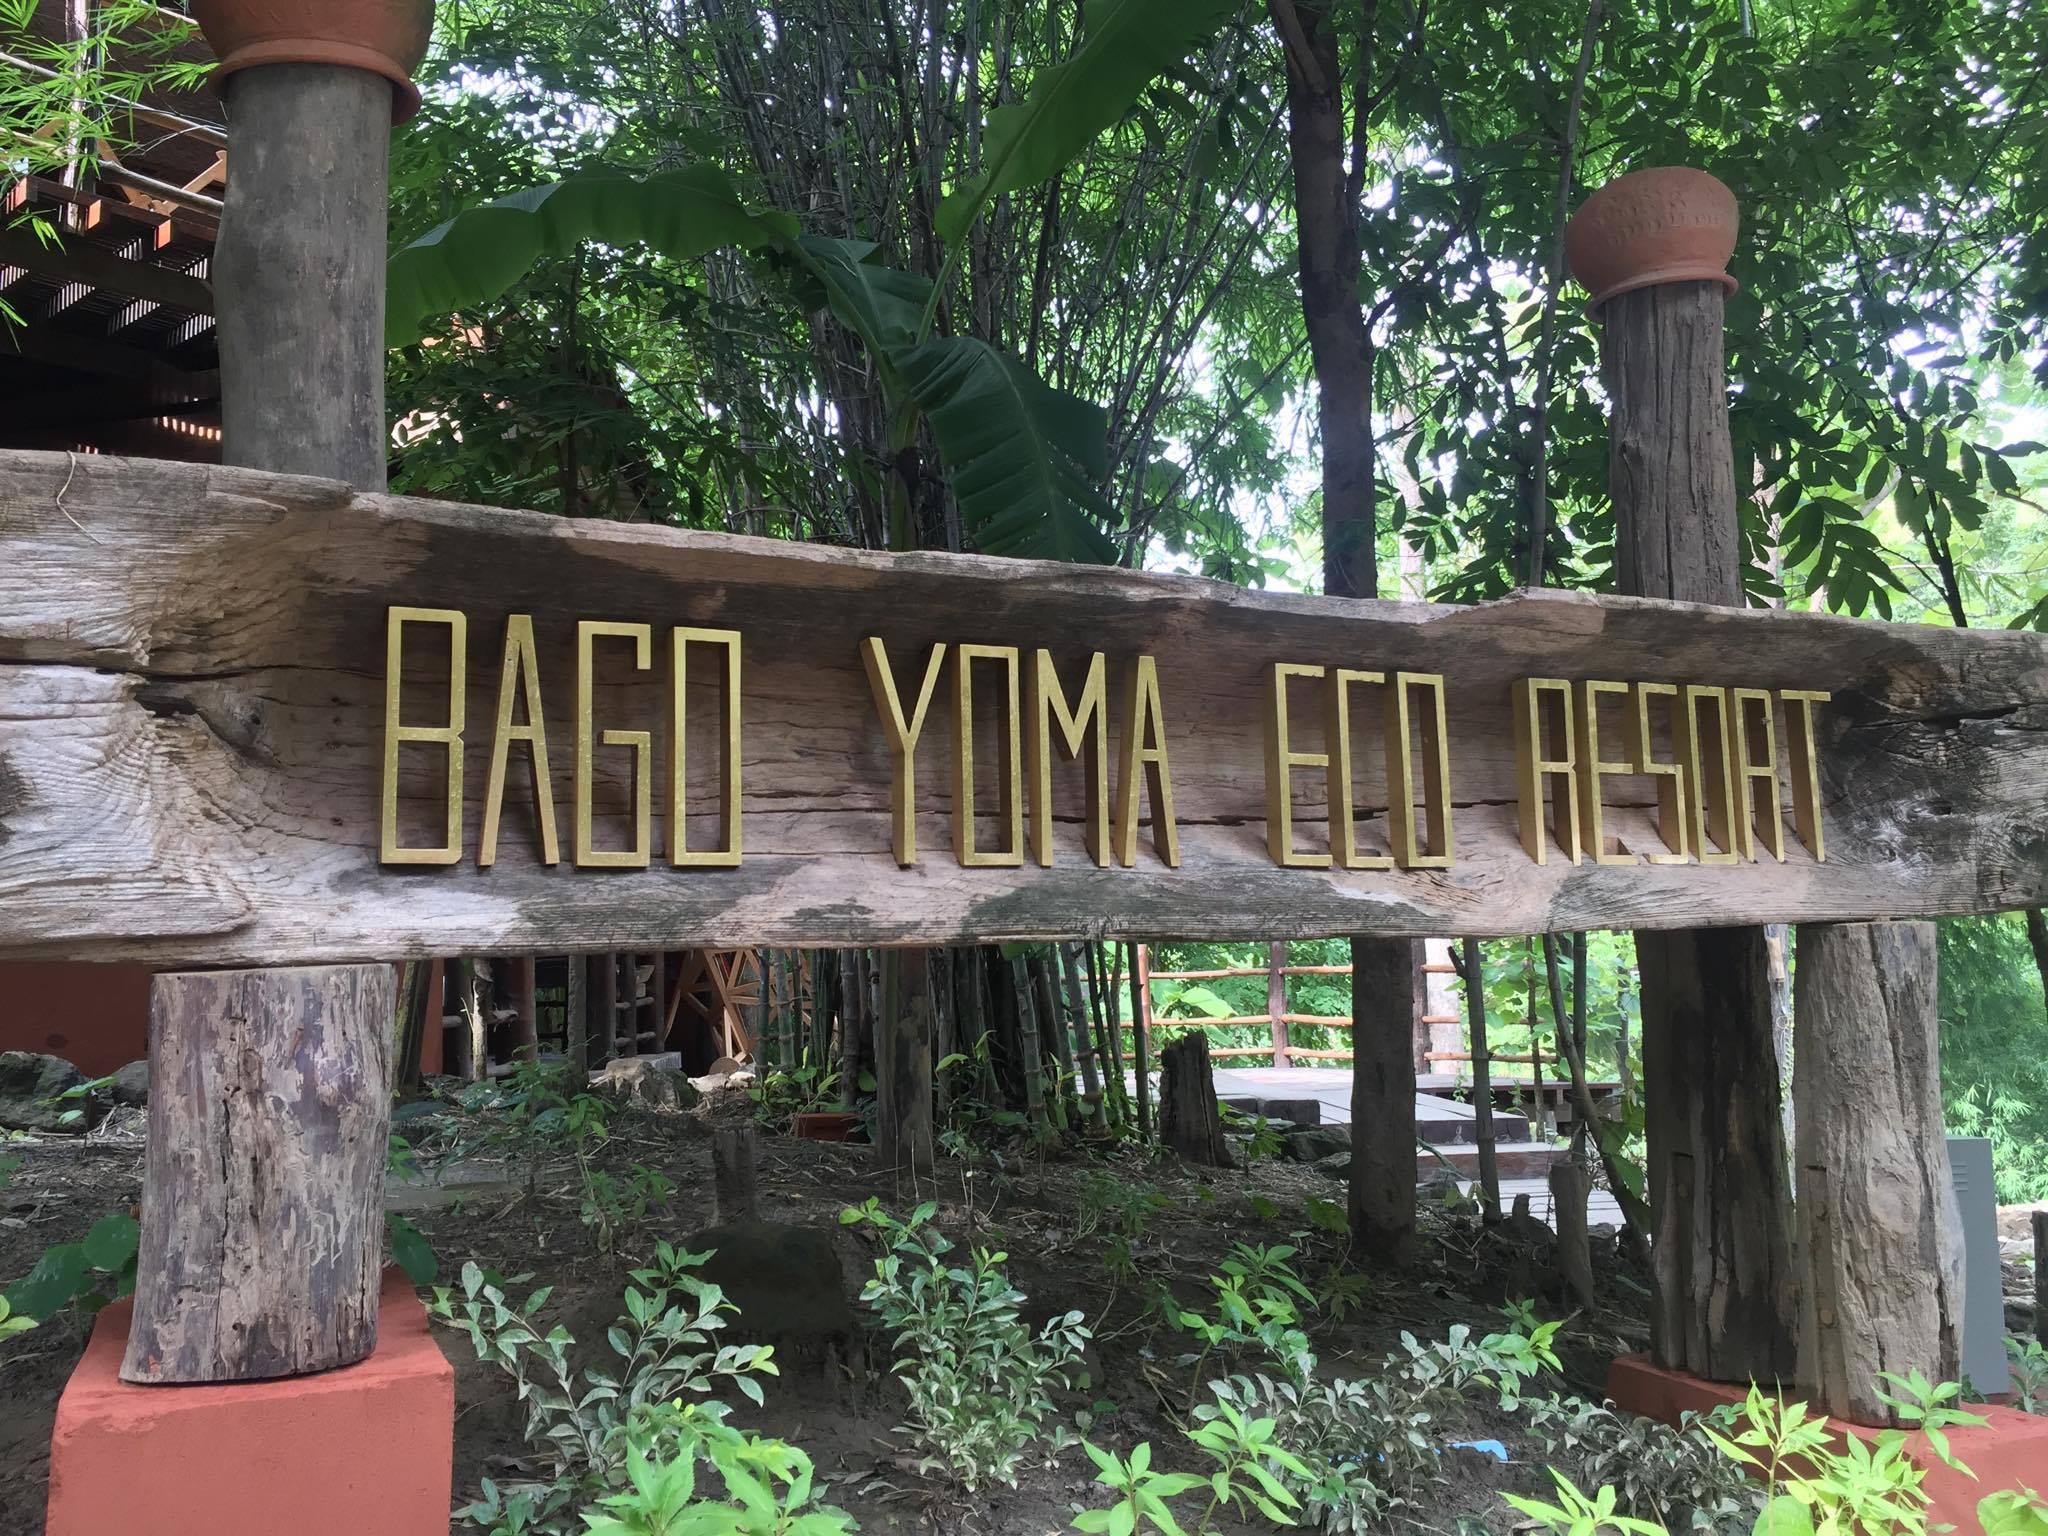 Bago Yoma Eco Resort